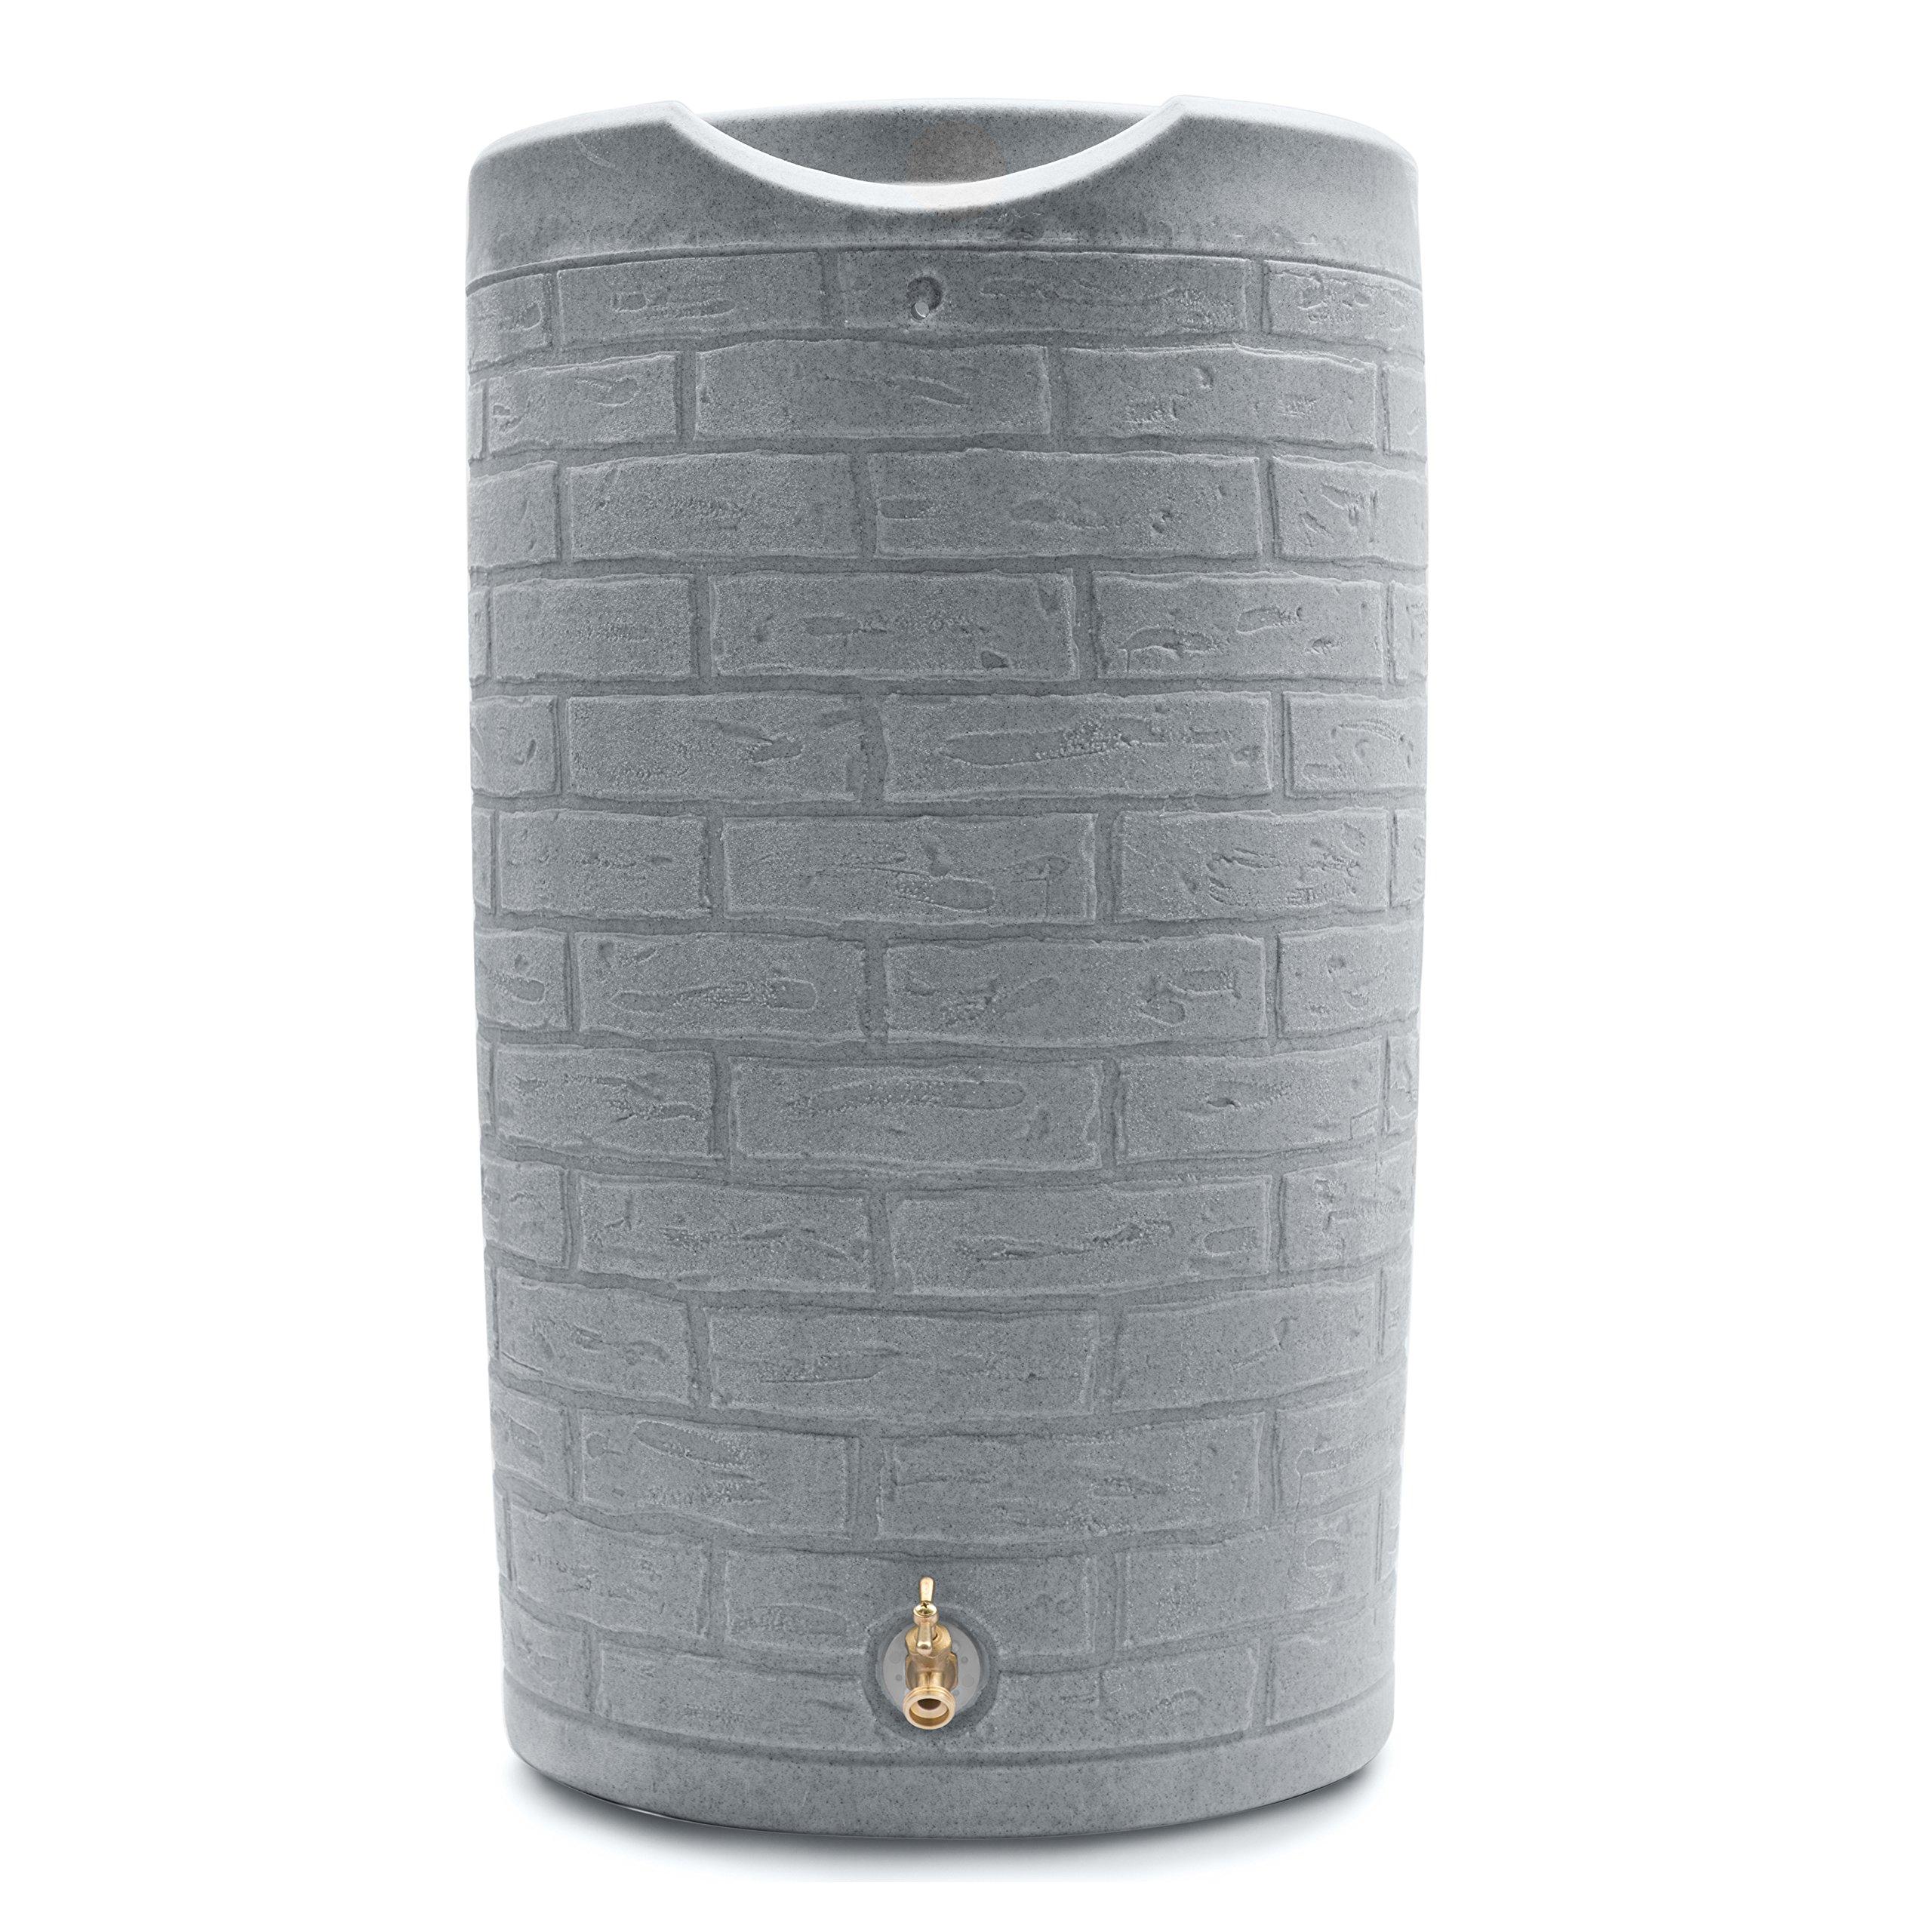 Good Ideas IMP-D50-SLA Impressions Downton Rain Saver Rain Barrel, 50 gallon, Slate